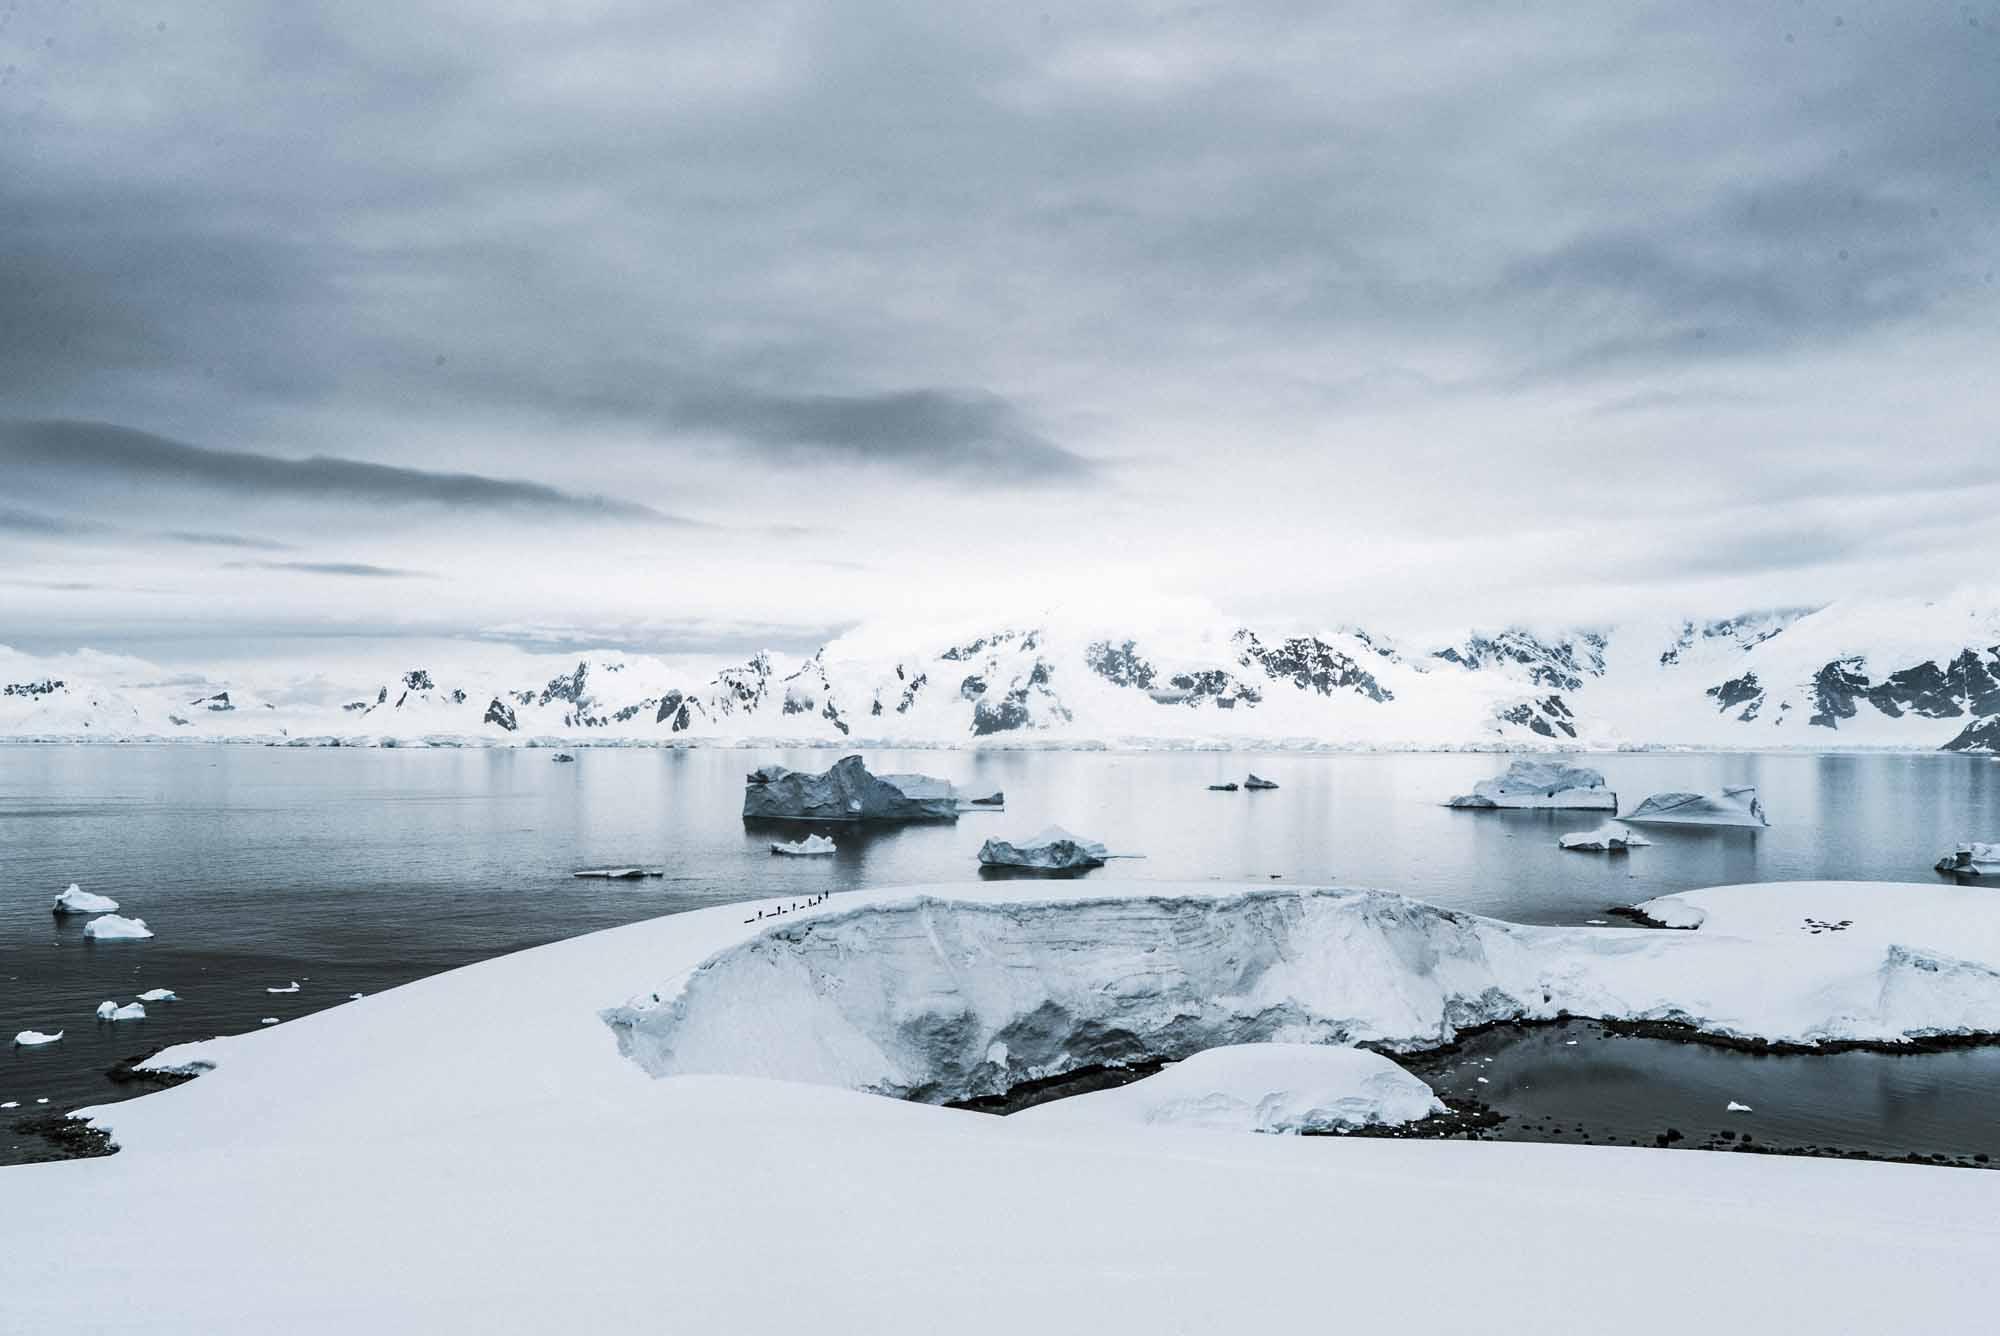 Polar-Quest-Exploration-Polaire-Exploring-Boundaries-in-Antarctica-Caroline-Cote-photo-the-Forbidden-Plateau